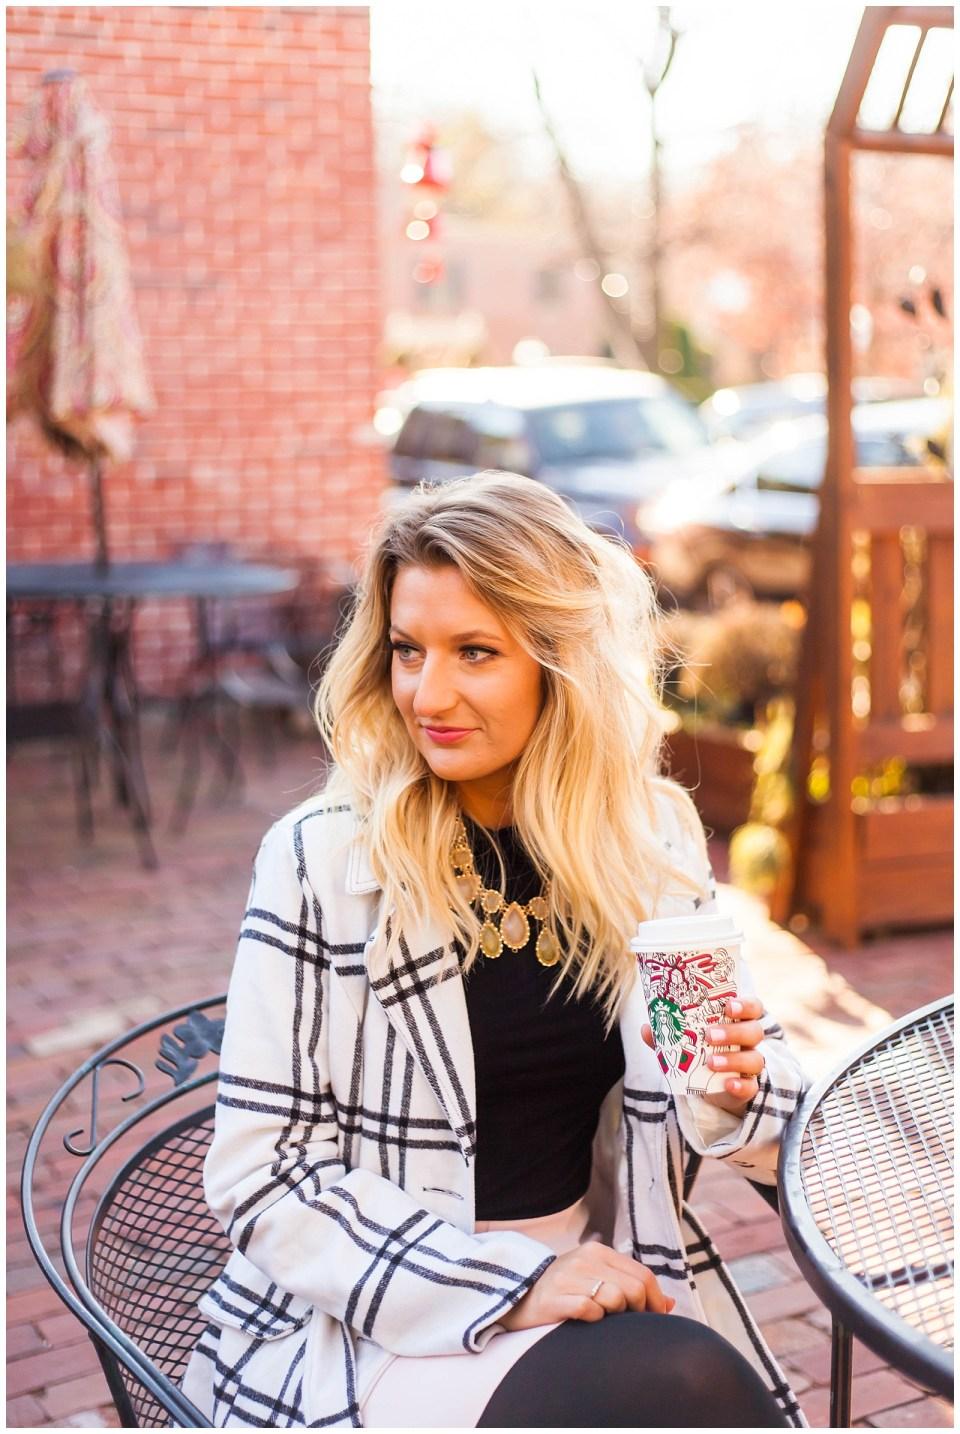 Kalifornia Beauty Blog || St. Louis Fashion Blog Photographer